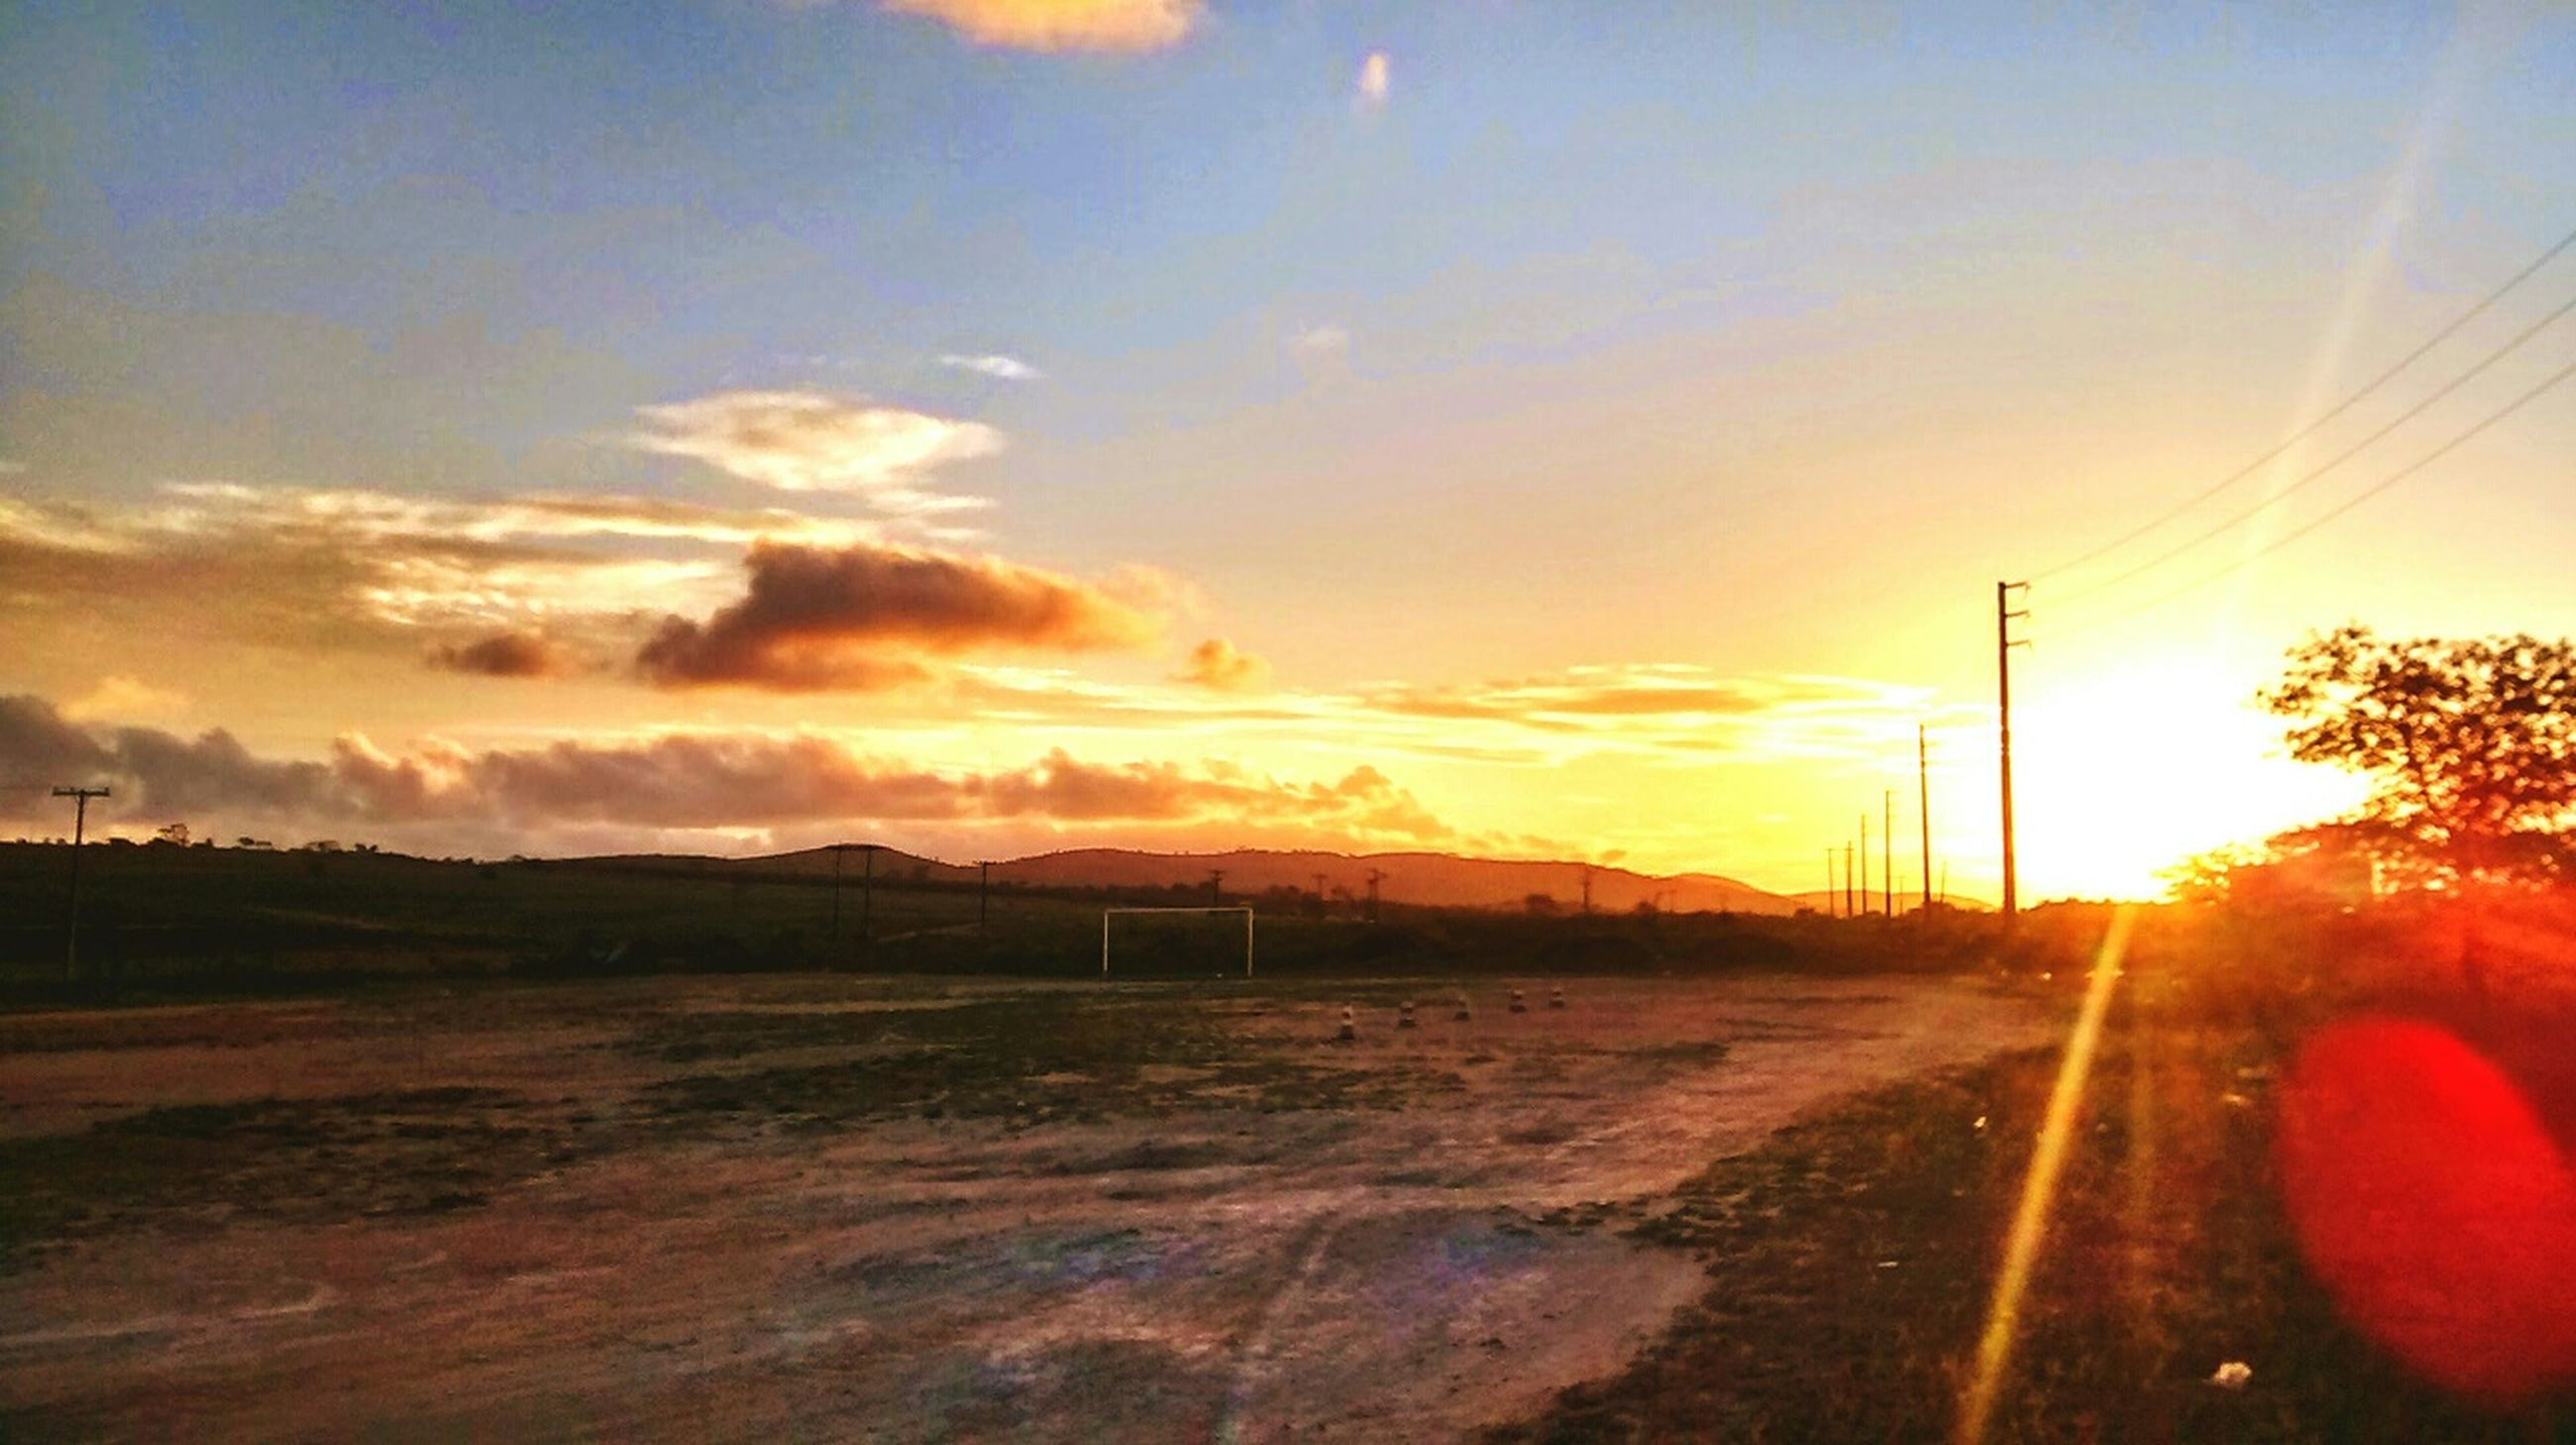 sunset, sun, sky, orange color, lens flare, sunbeam, sunlight, transportation, road, landscape, tranquil scene, scenics, tranquility, beauty in nature, nature, cloud - sky, field, idyllic, the way forward, outdoors